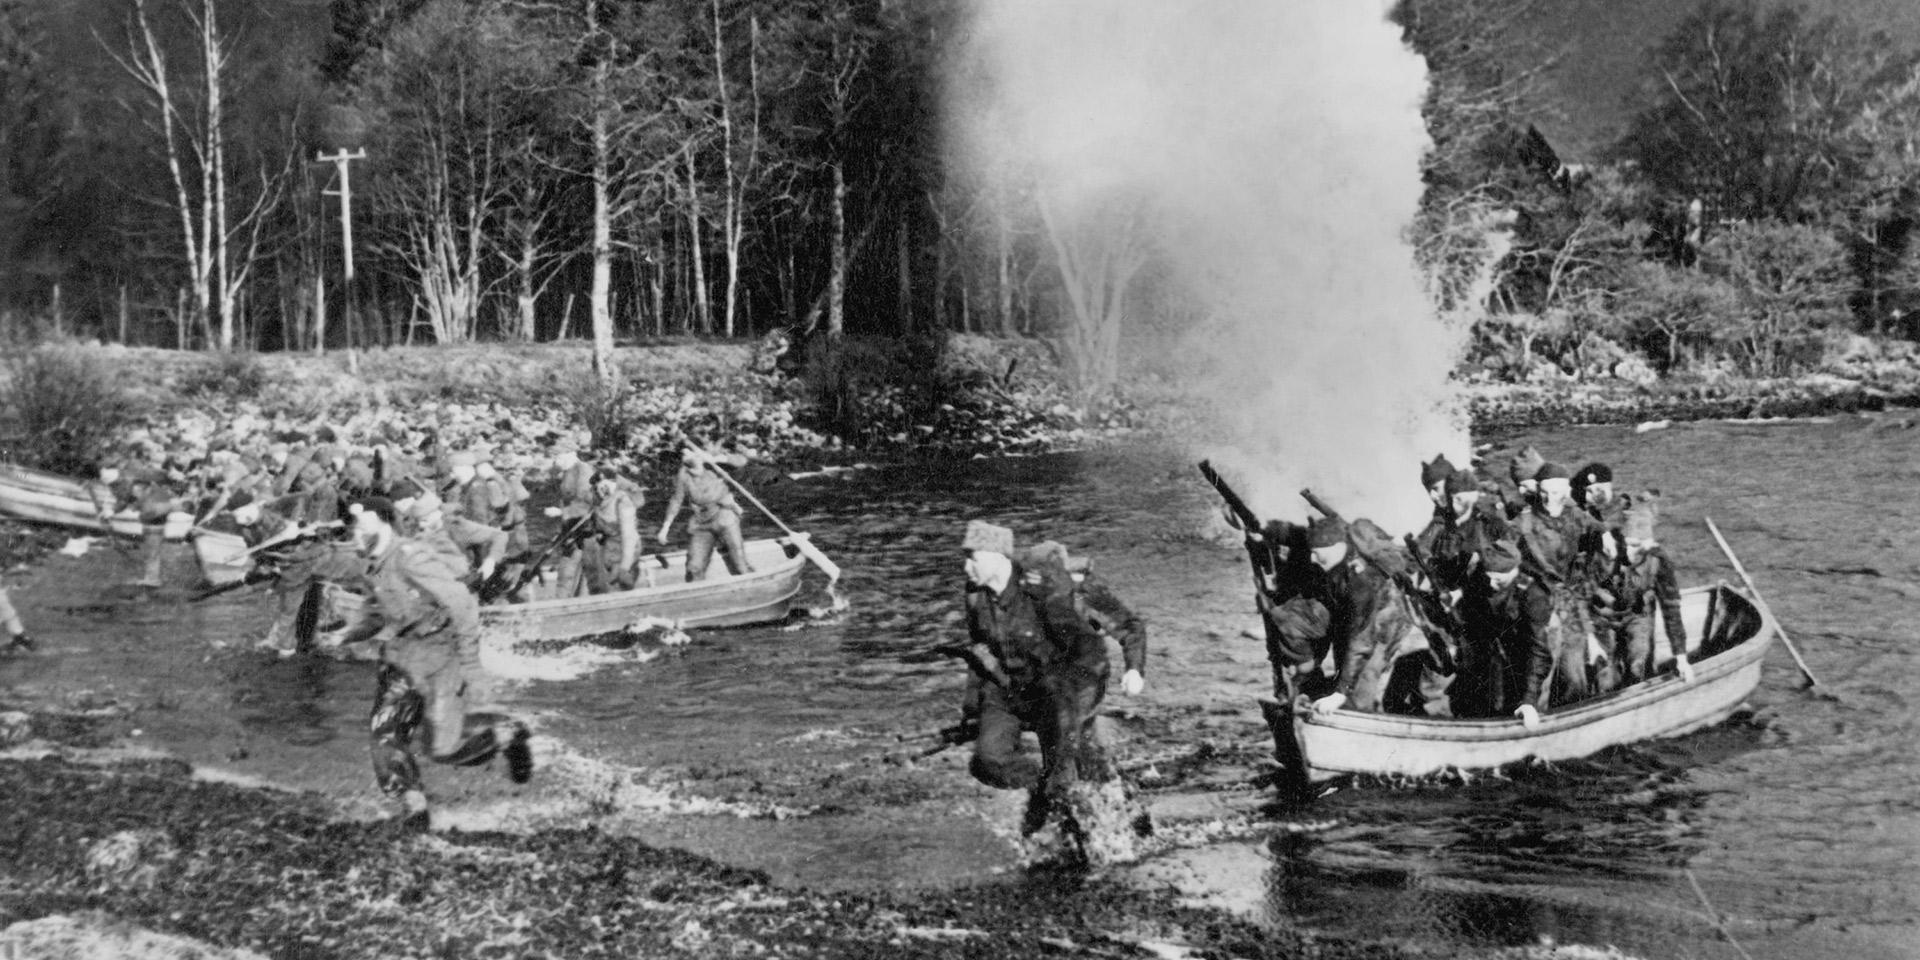 Assault landing at the Commando Training Centre, Achnacarry, Inverness-shire, 1942